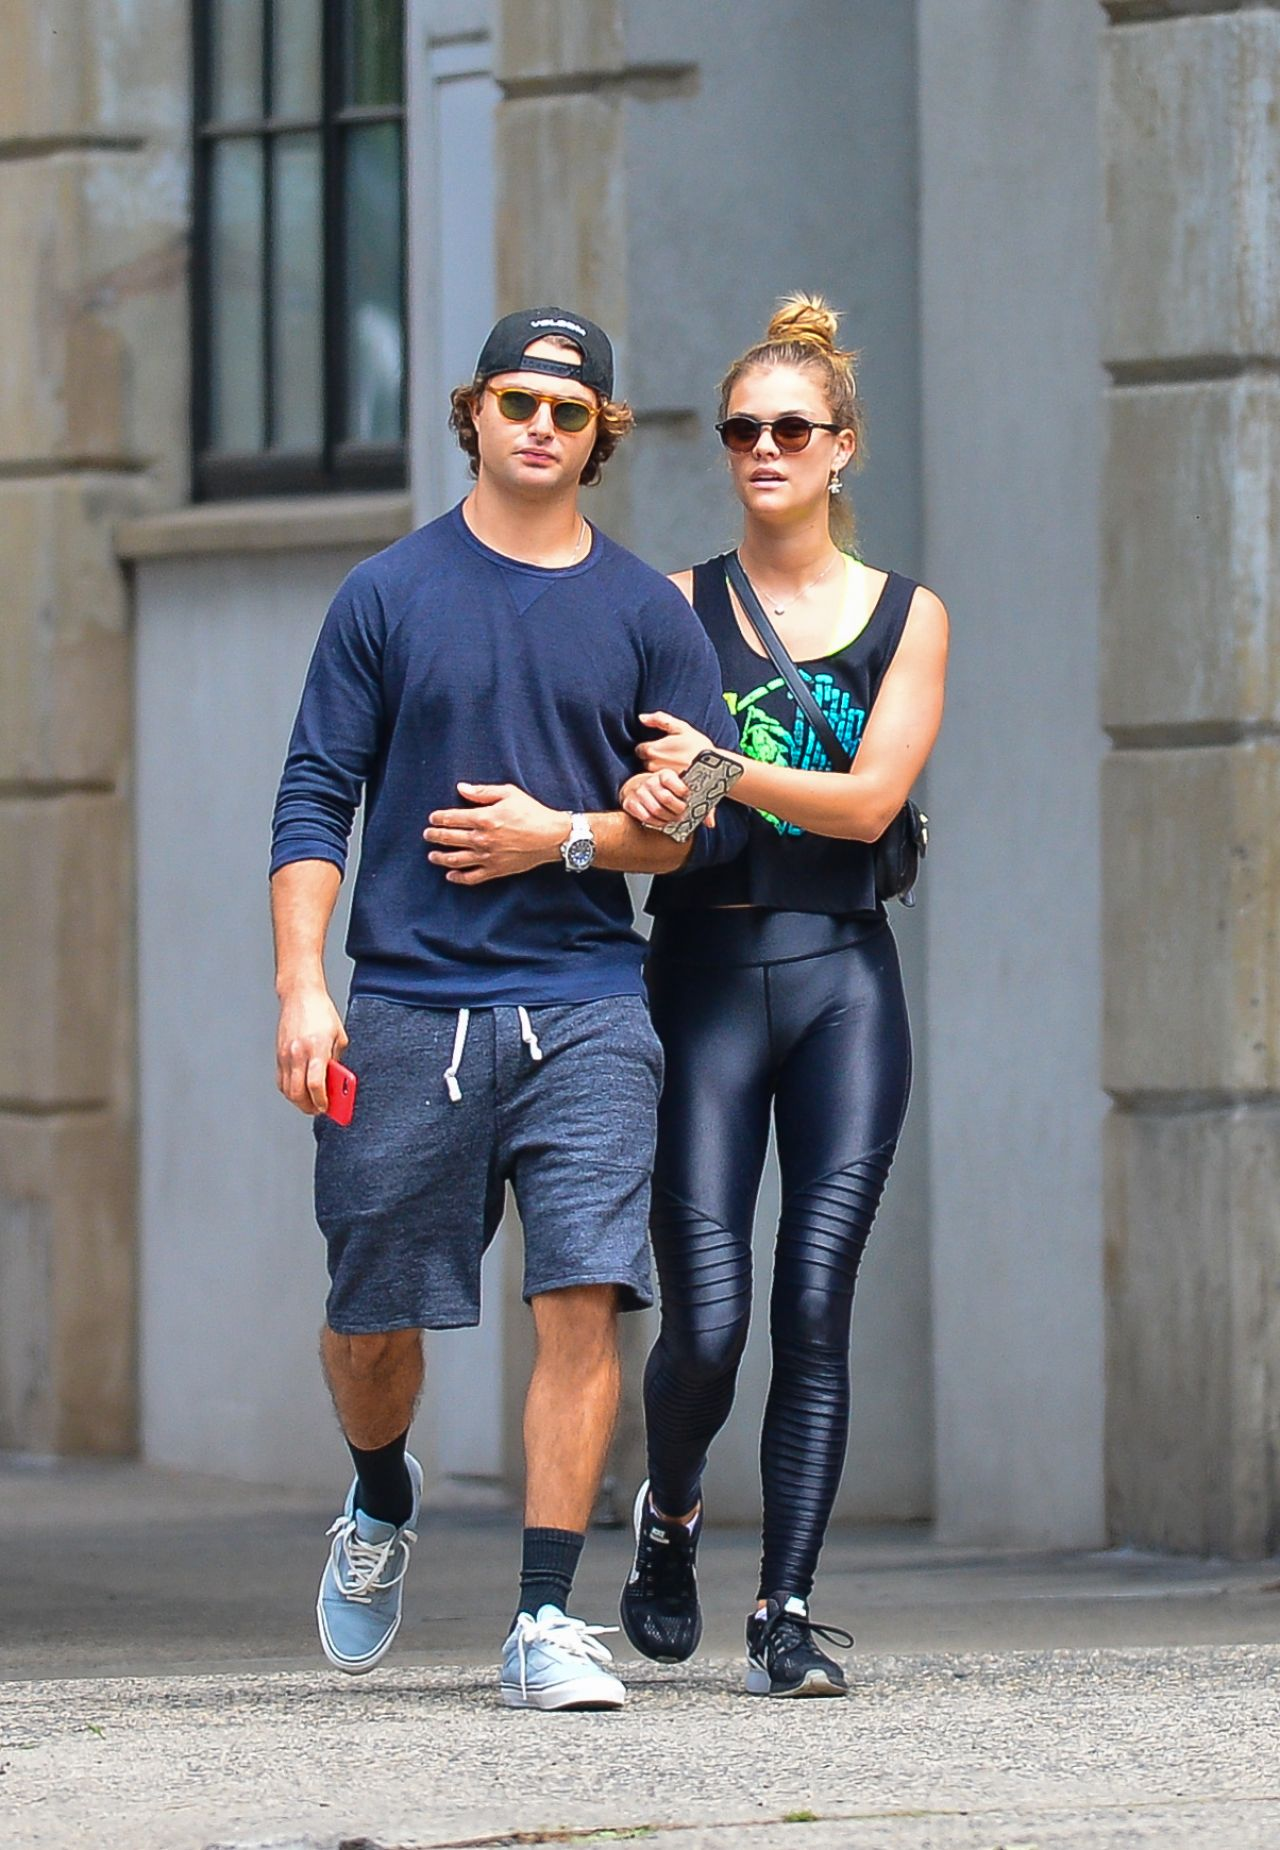 Nina Agdal With Her Boyfriend Jack Brinkley-Cook - Leaving